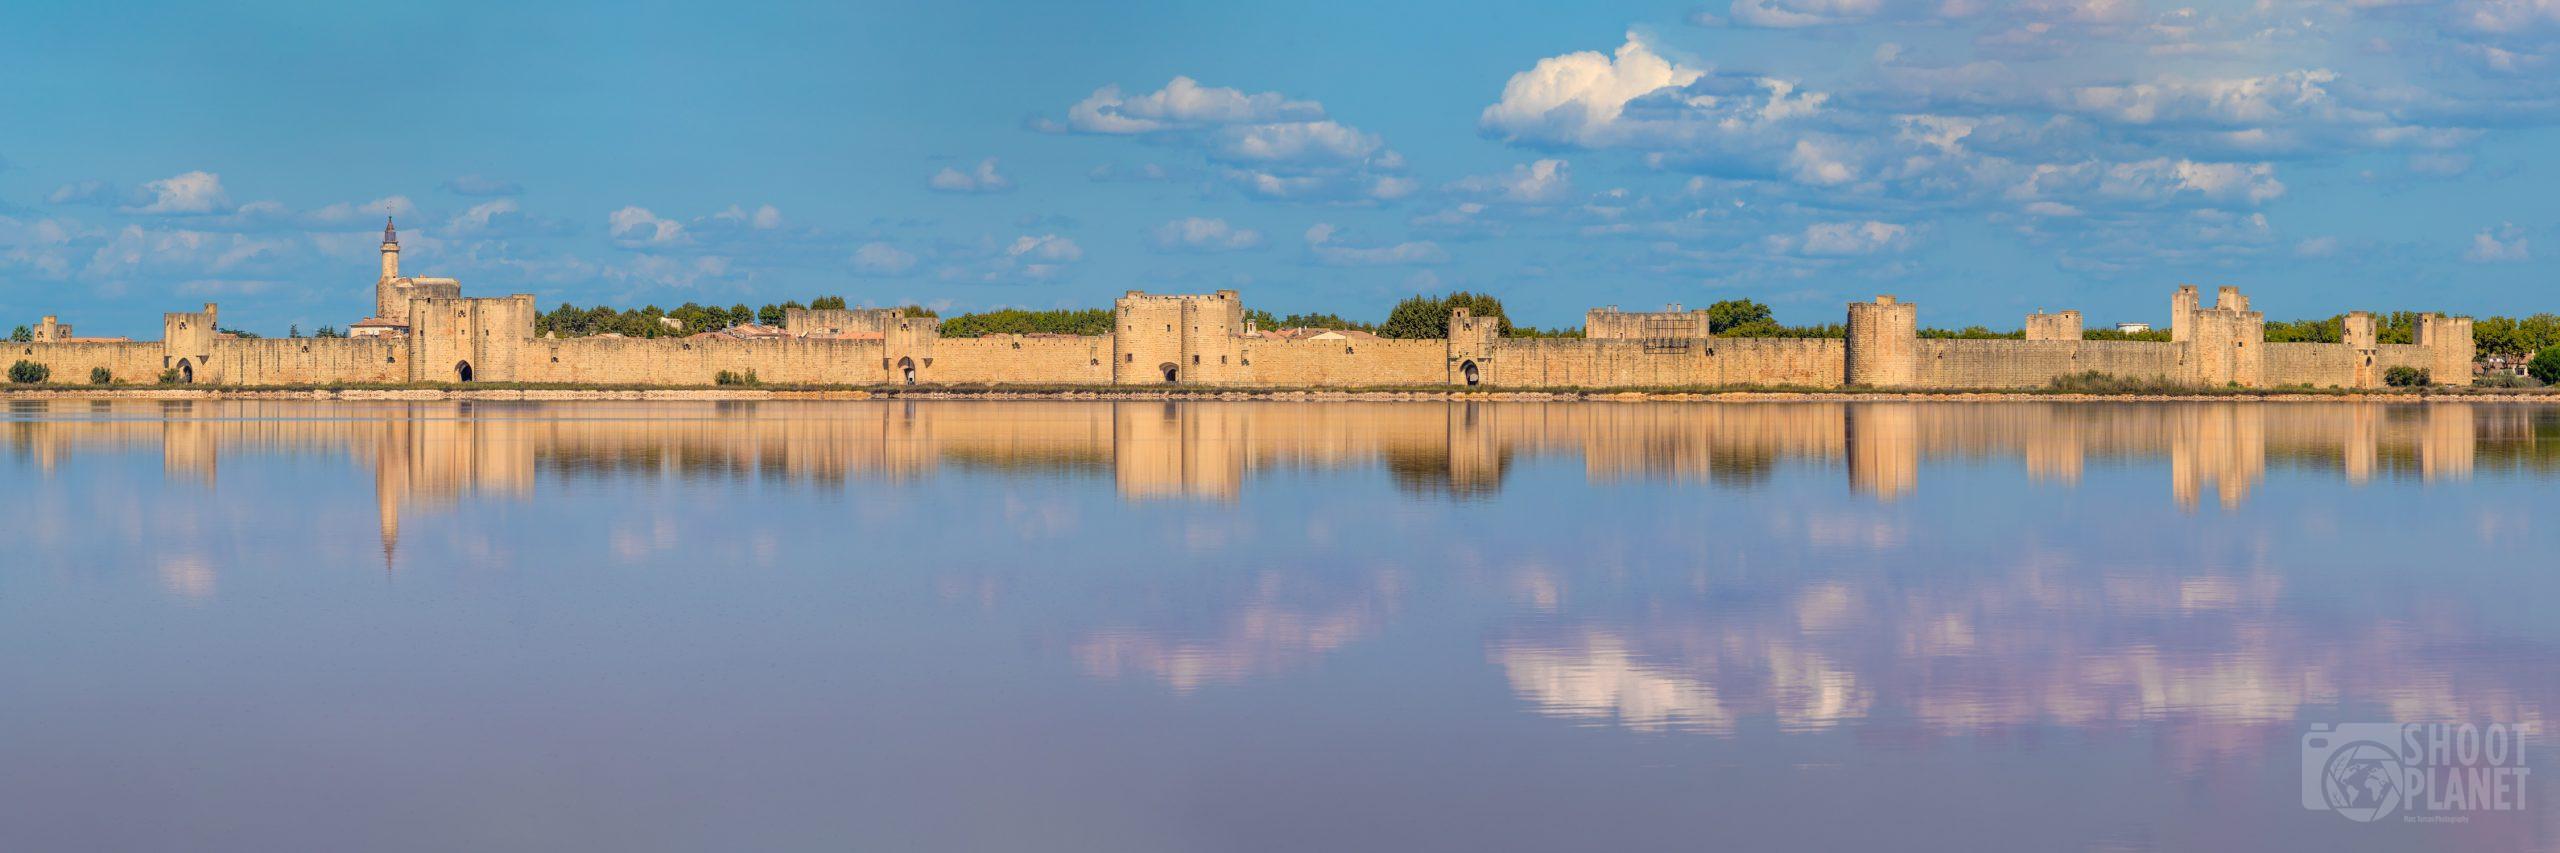 Aigues-Mortes walls and saltworks panorama, Camargue France